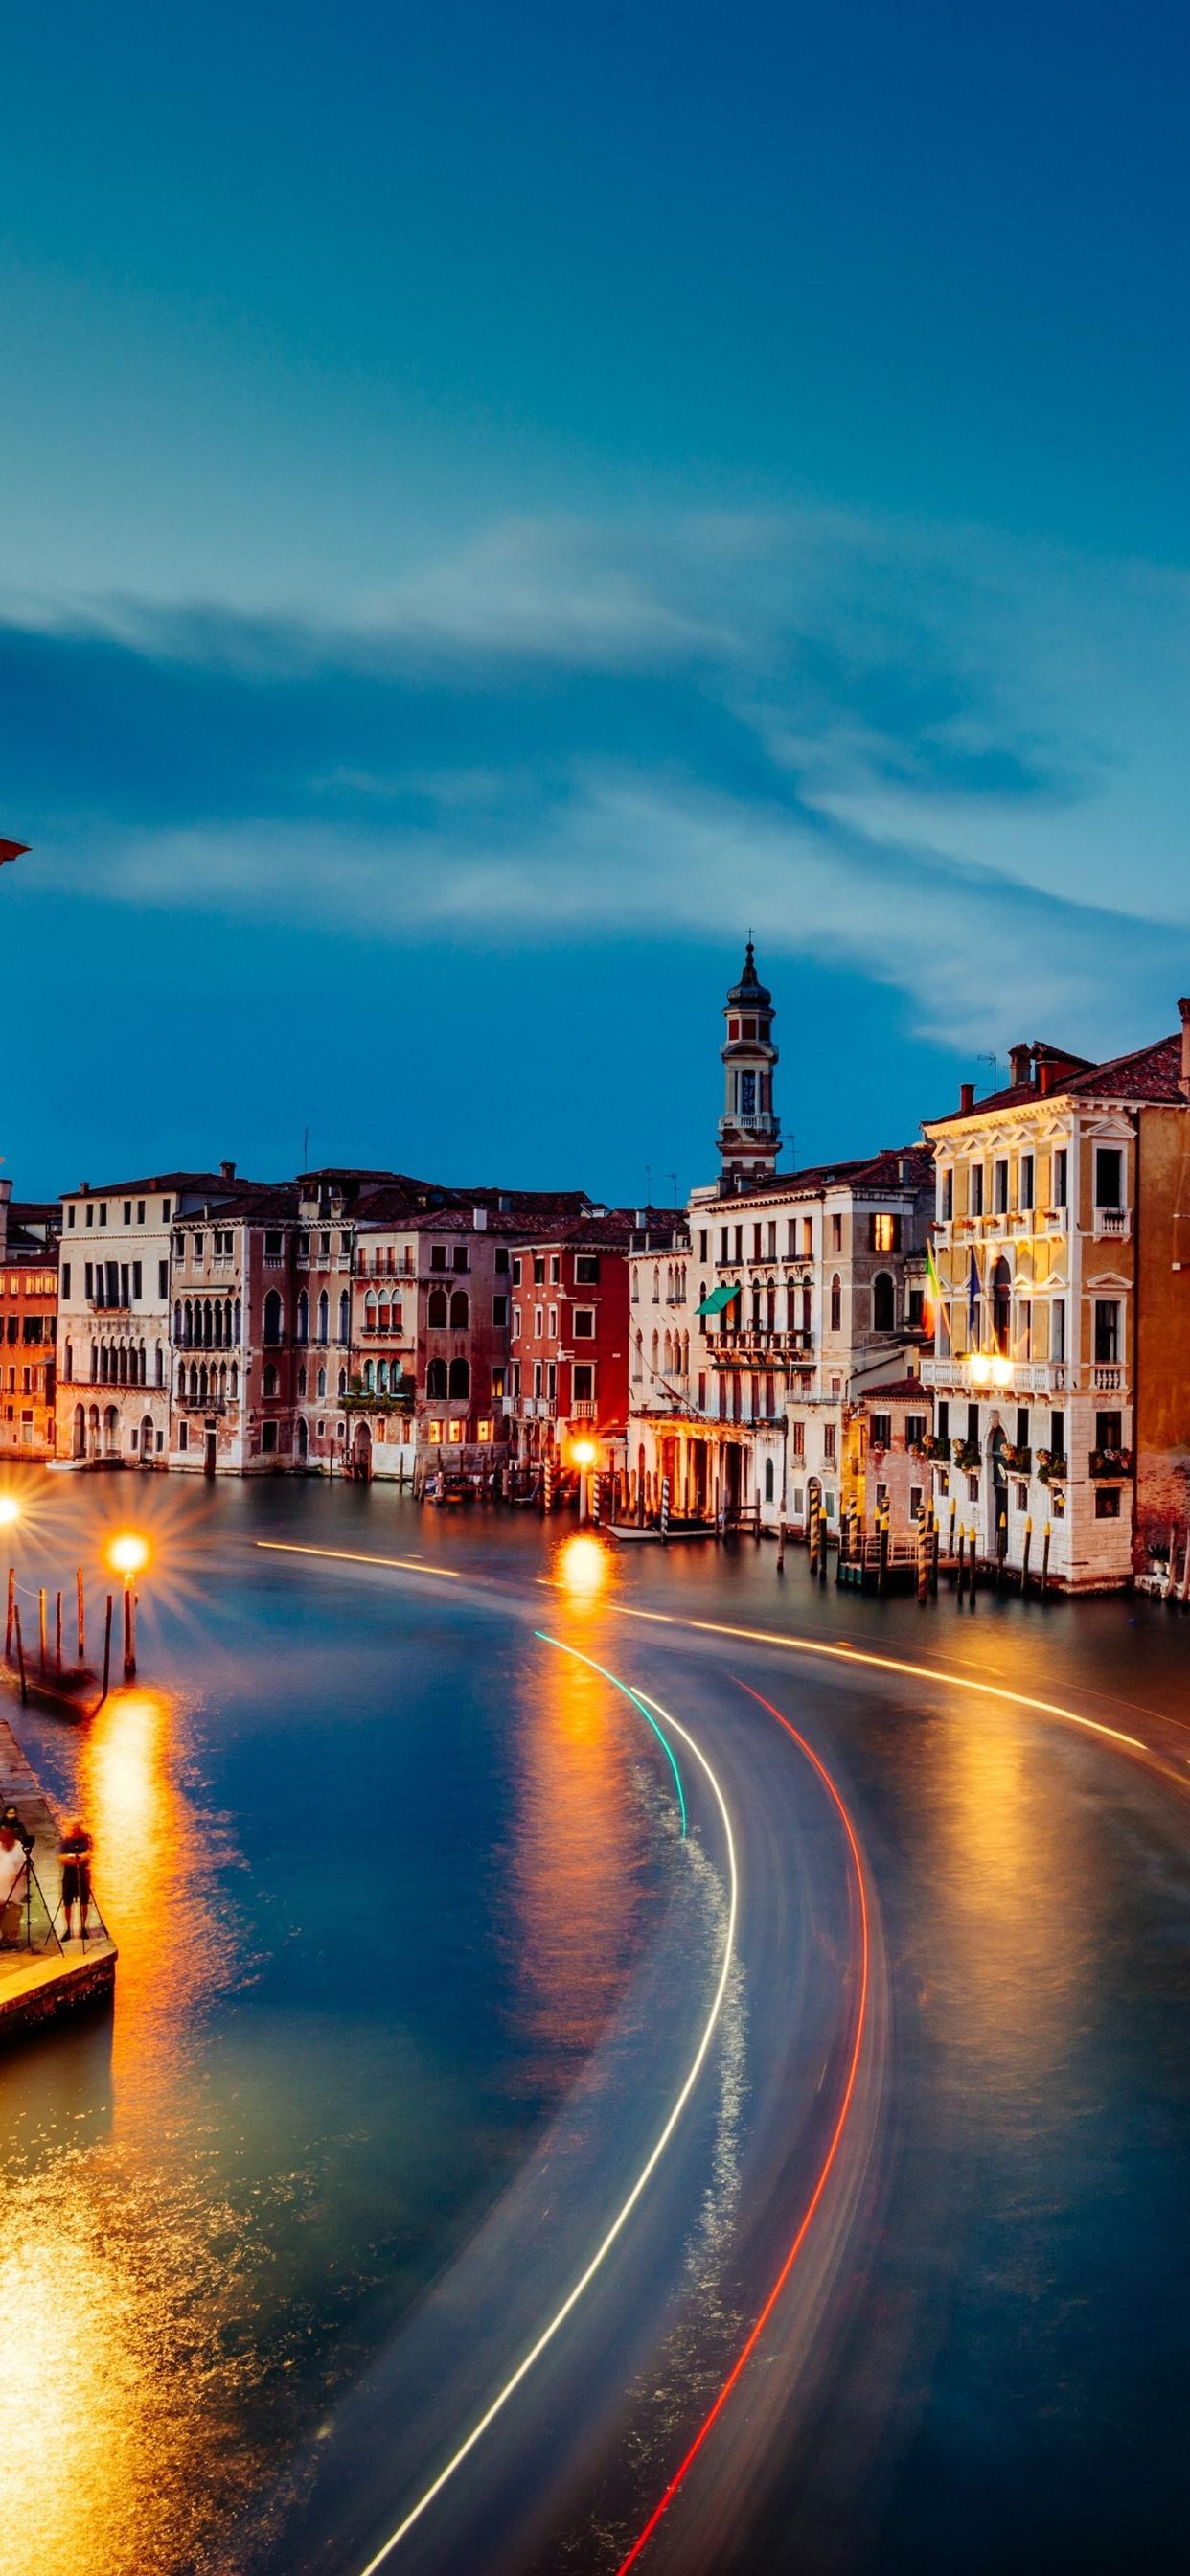 Night Venice beautiful italy wallpaper Gallery 1242x2688